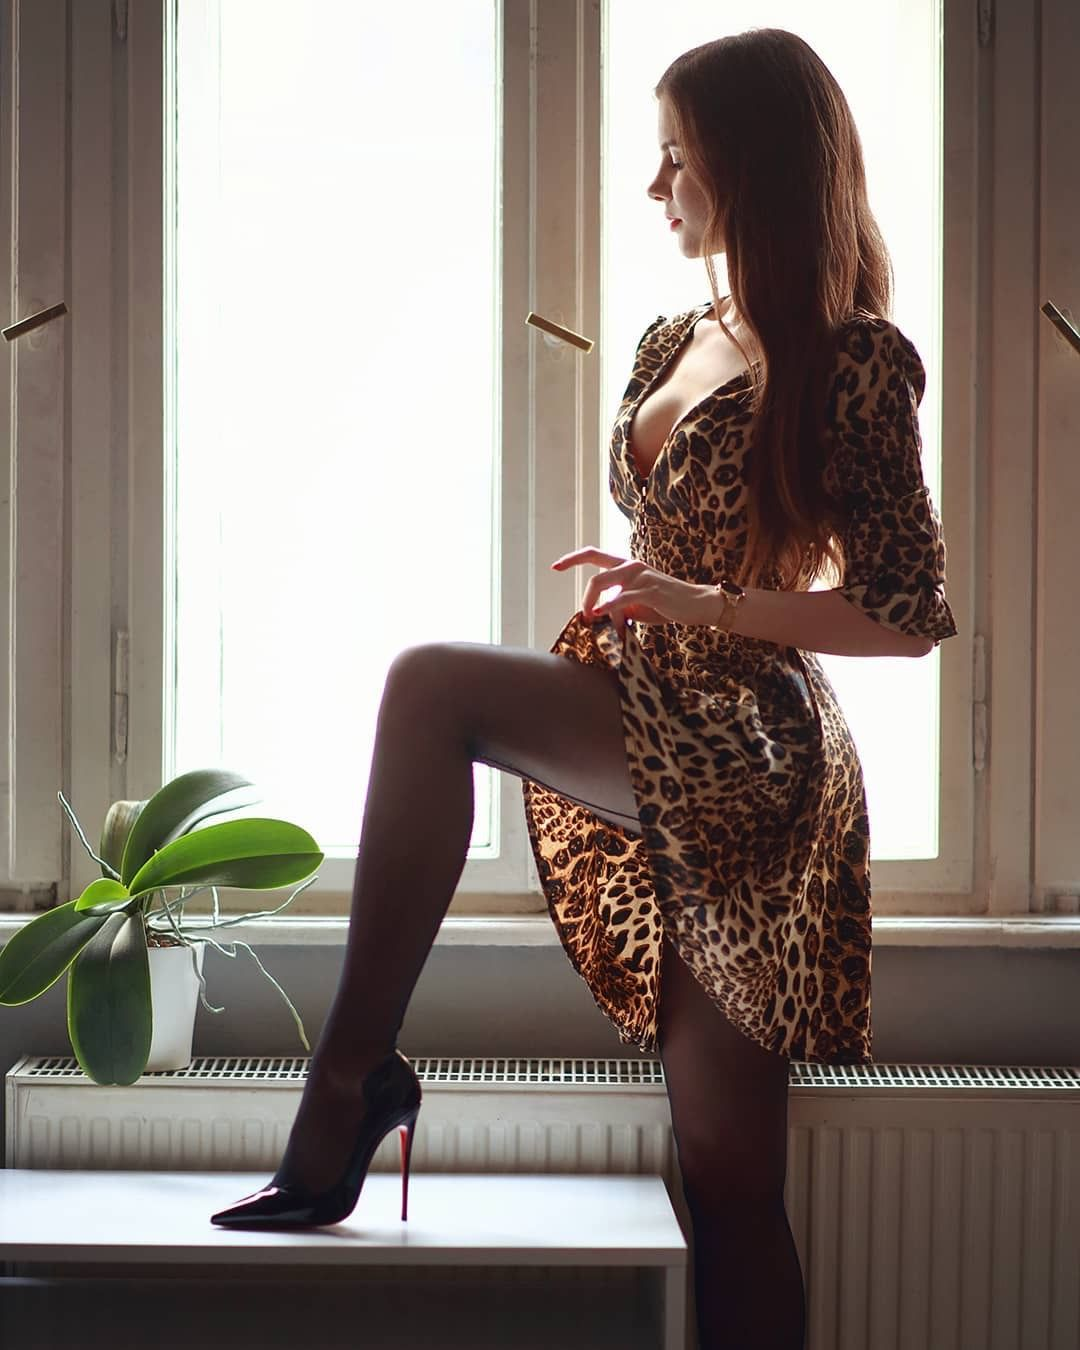 449ec5a202634 Beautiful Ariadna Majewsa Nice Legs, Beautiful Legs, Beautiful Women,  Nylons Heels, Pantyhose